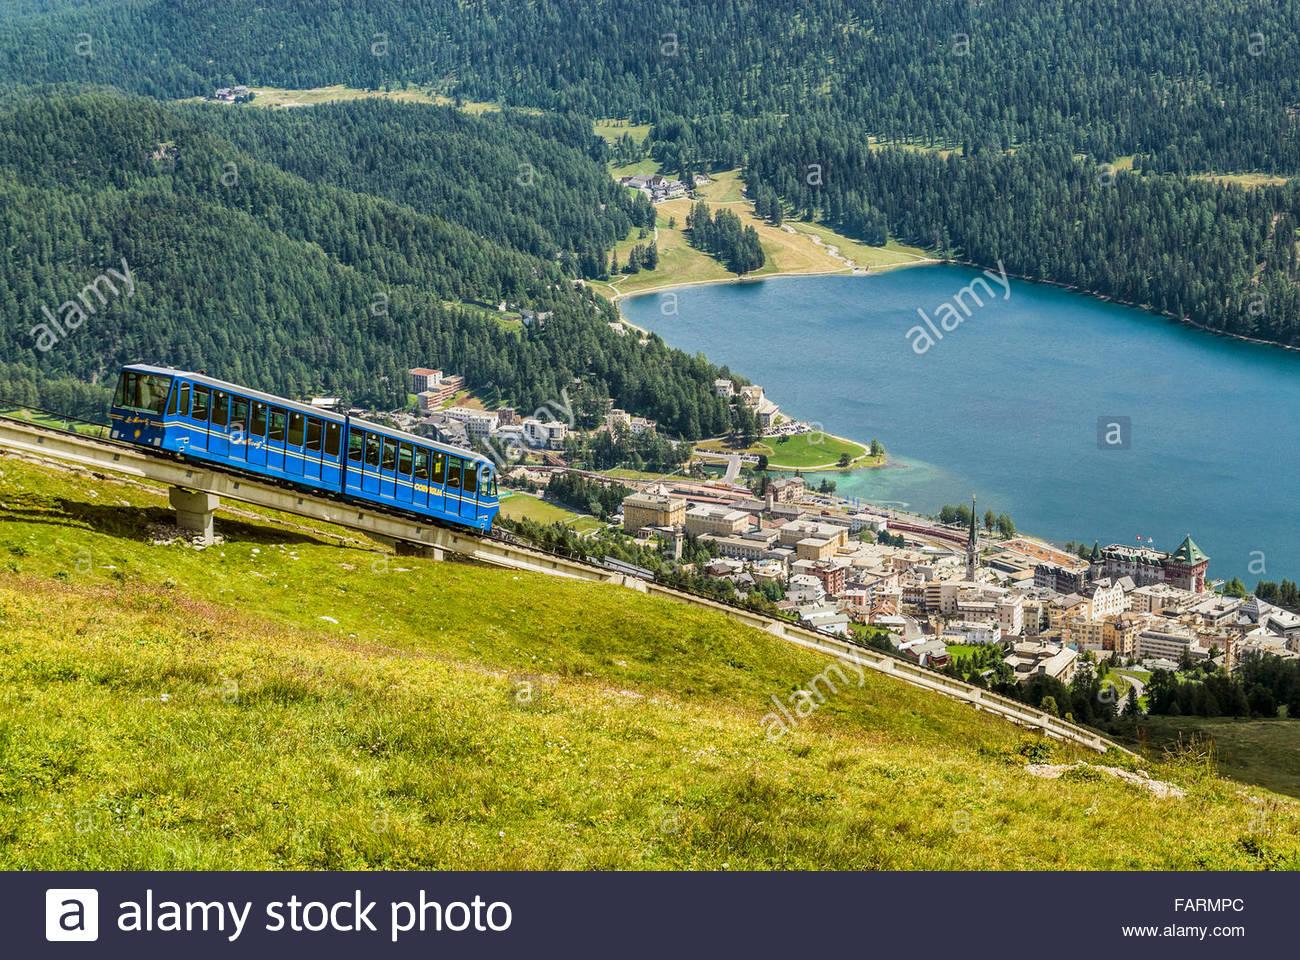 Standseilbahn Chantarella, St. Moritz, Graubünden, Schweiz   Chantarella Standseilbahn, St. Moritz, Schweiz Stockbild